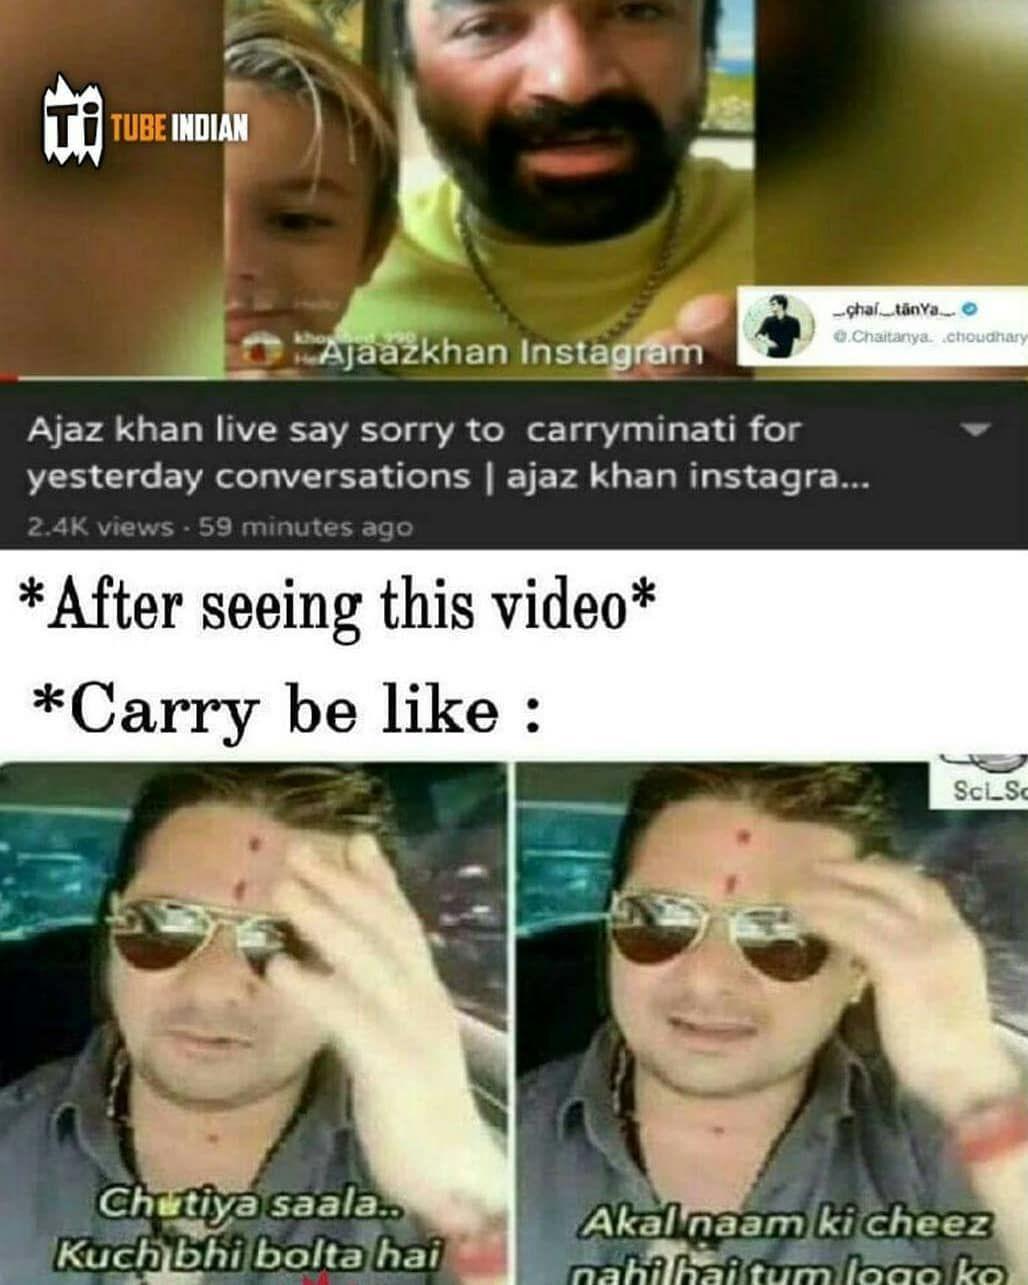 Funnyest Amir Siddiqui Memes Tik Tok Vs Youtube Images Download Youtube Images Memes Youtube Memes